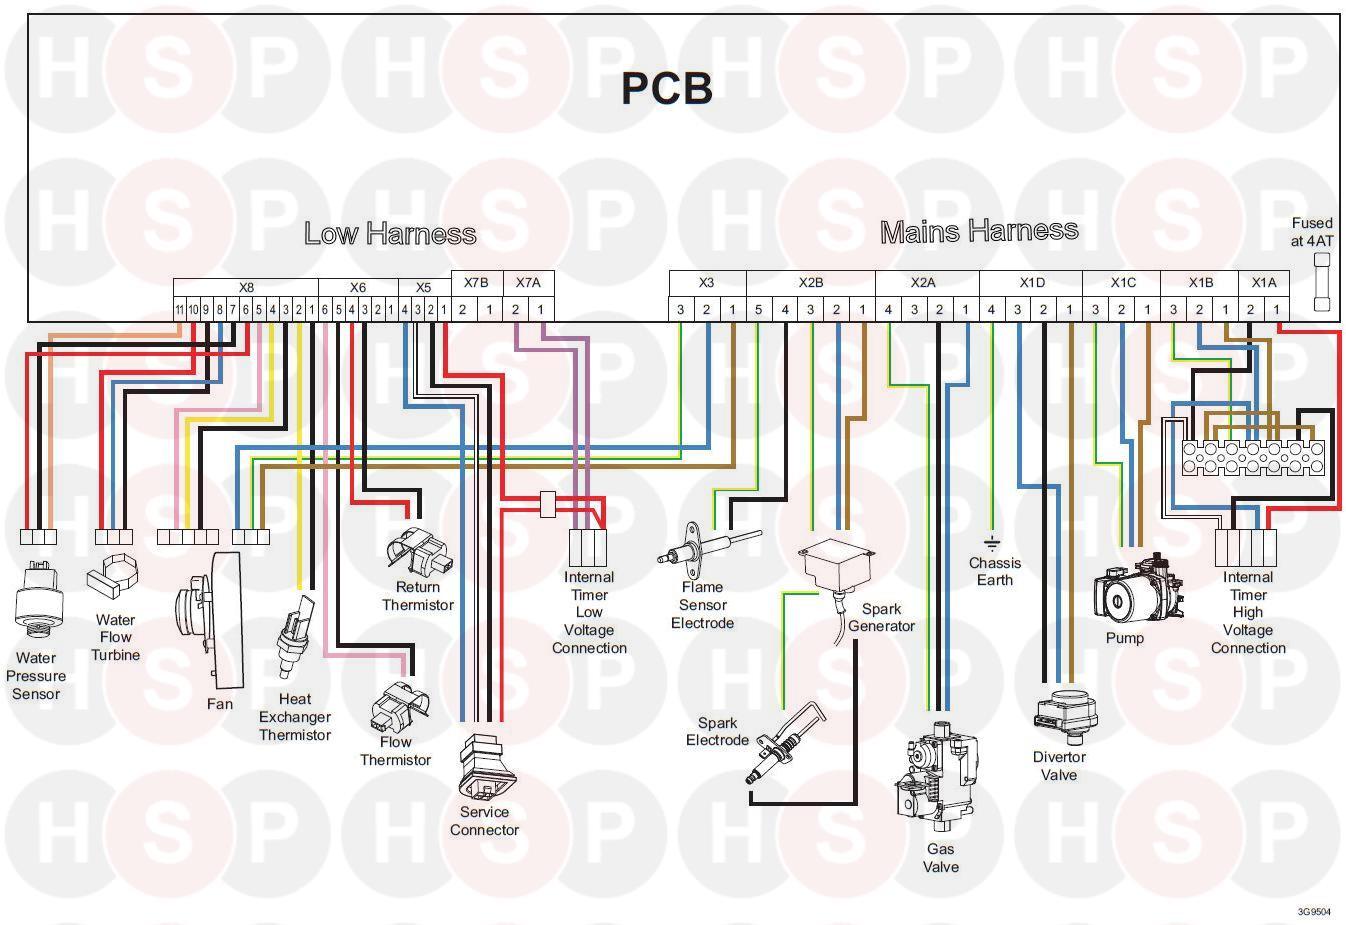 Ideal Logic Combi 30  Wiring Diagram  Diagram